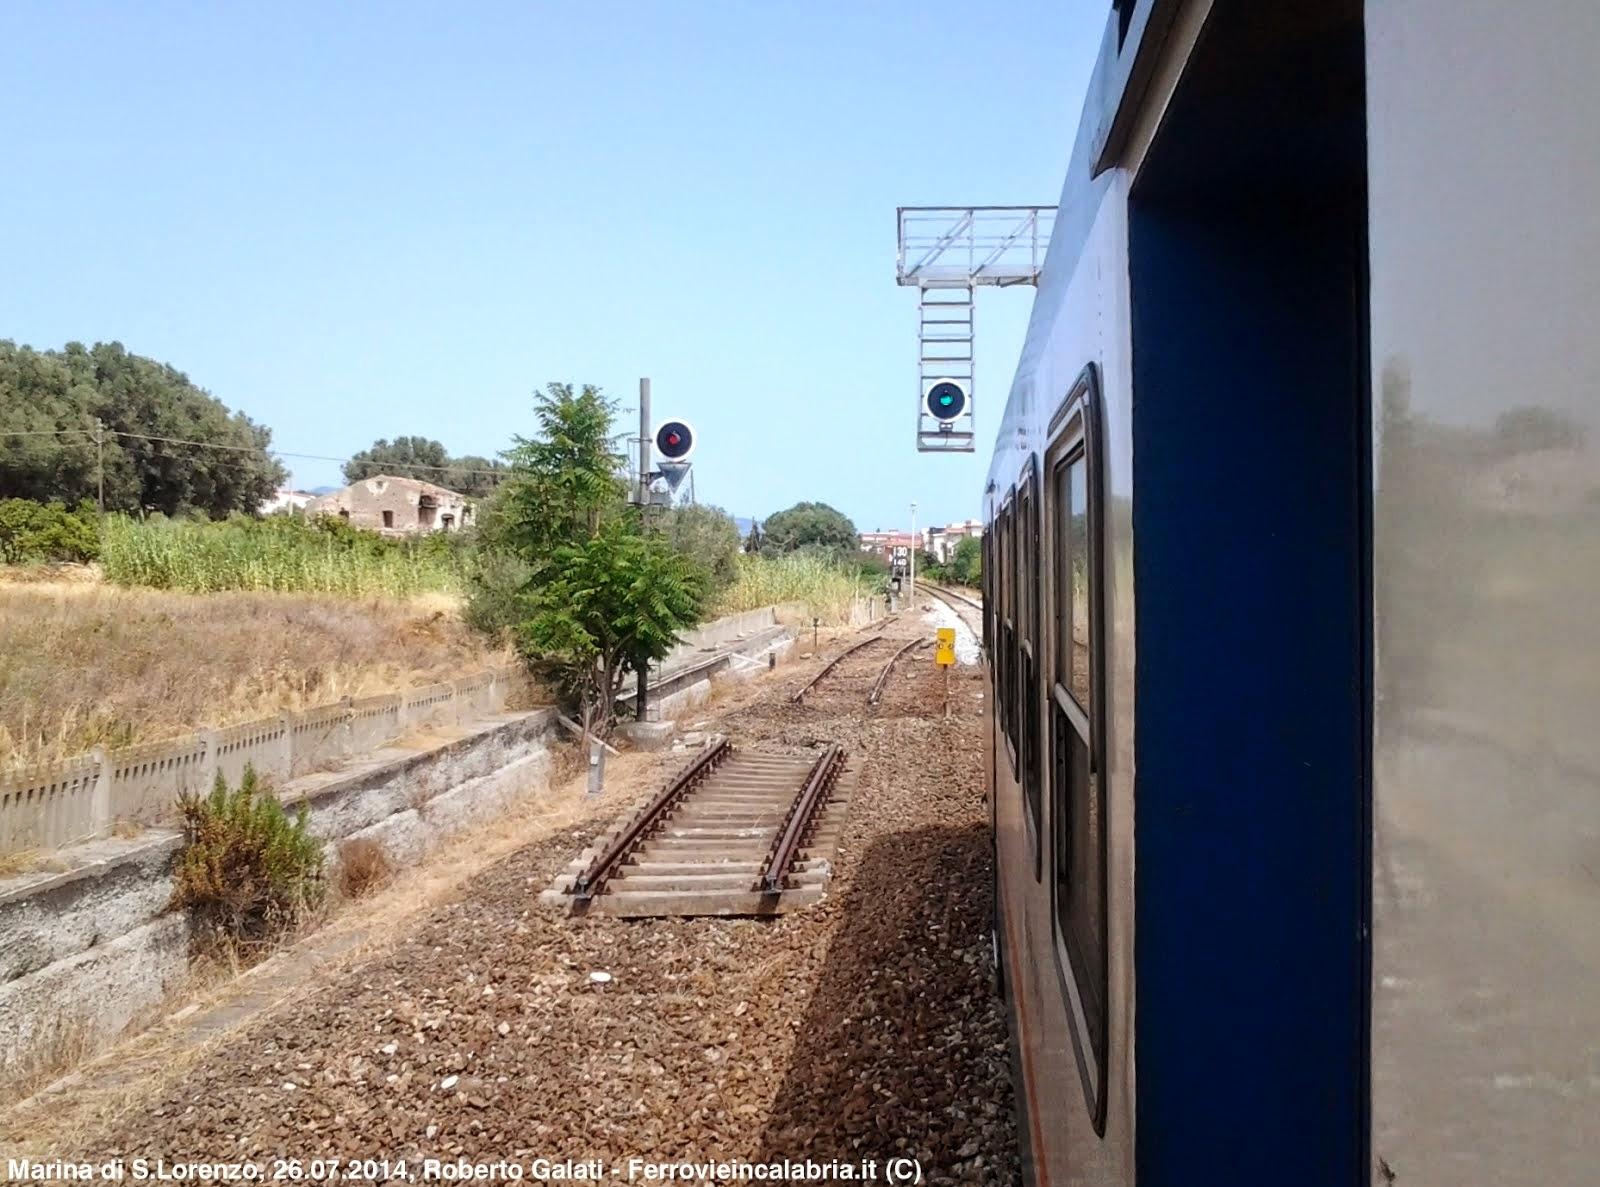 Associazione Ferrovie in Calabria - Archivio News 2011-2014